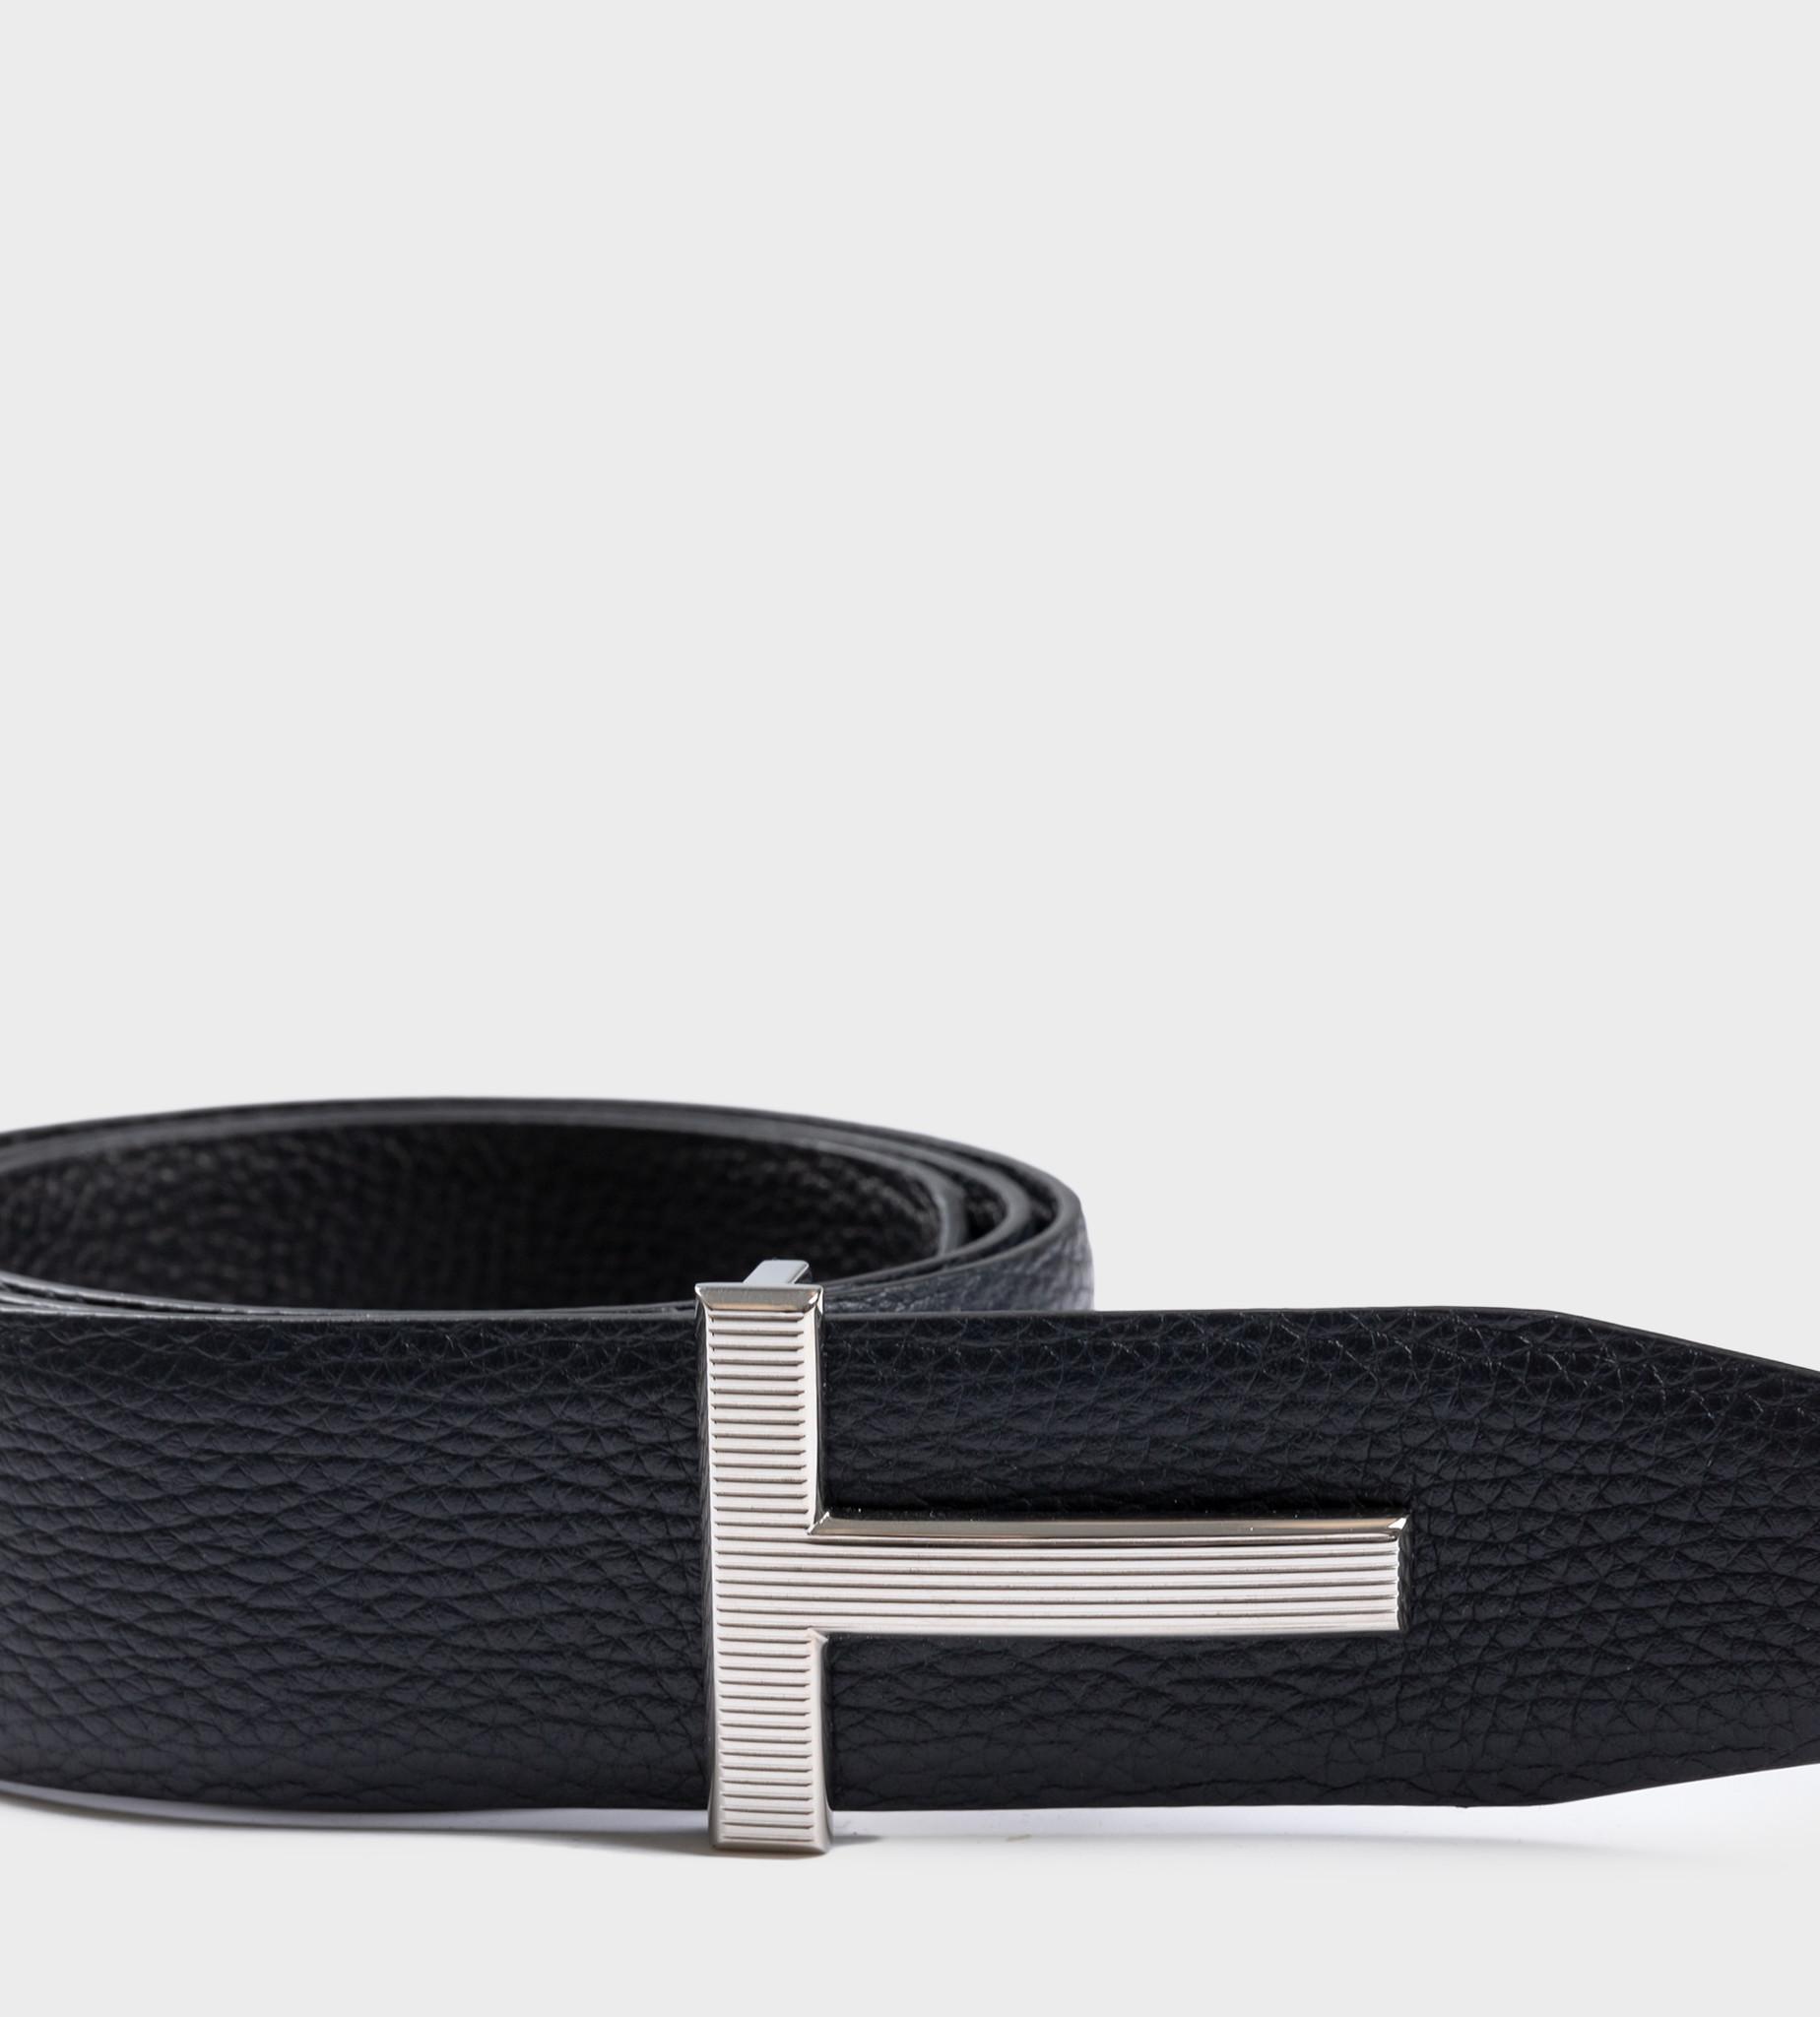 TOM FORD T Plague Reversible Belt Black